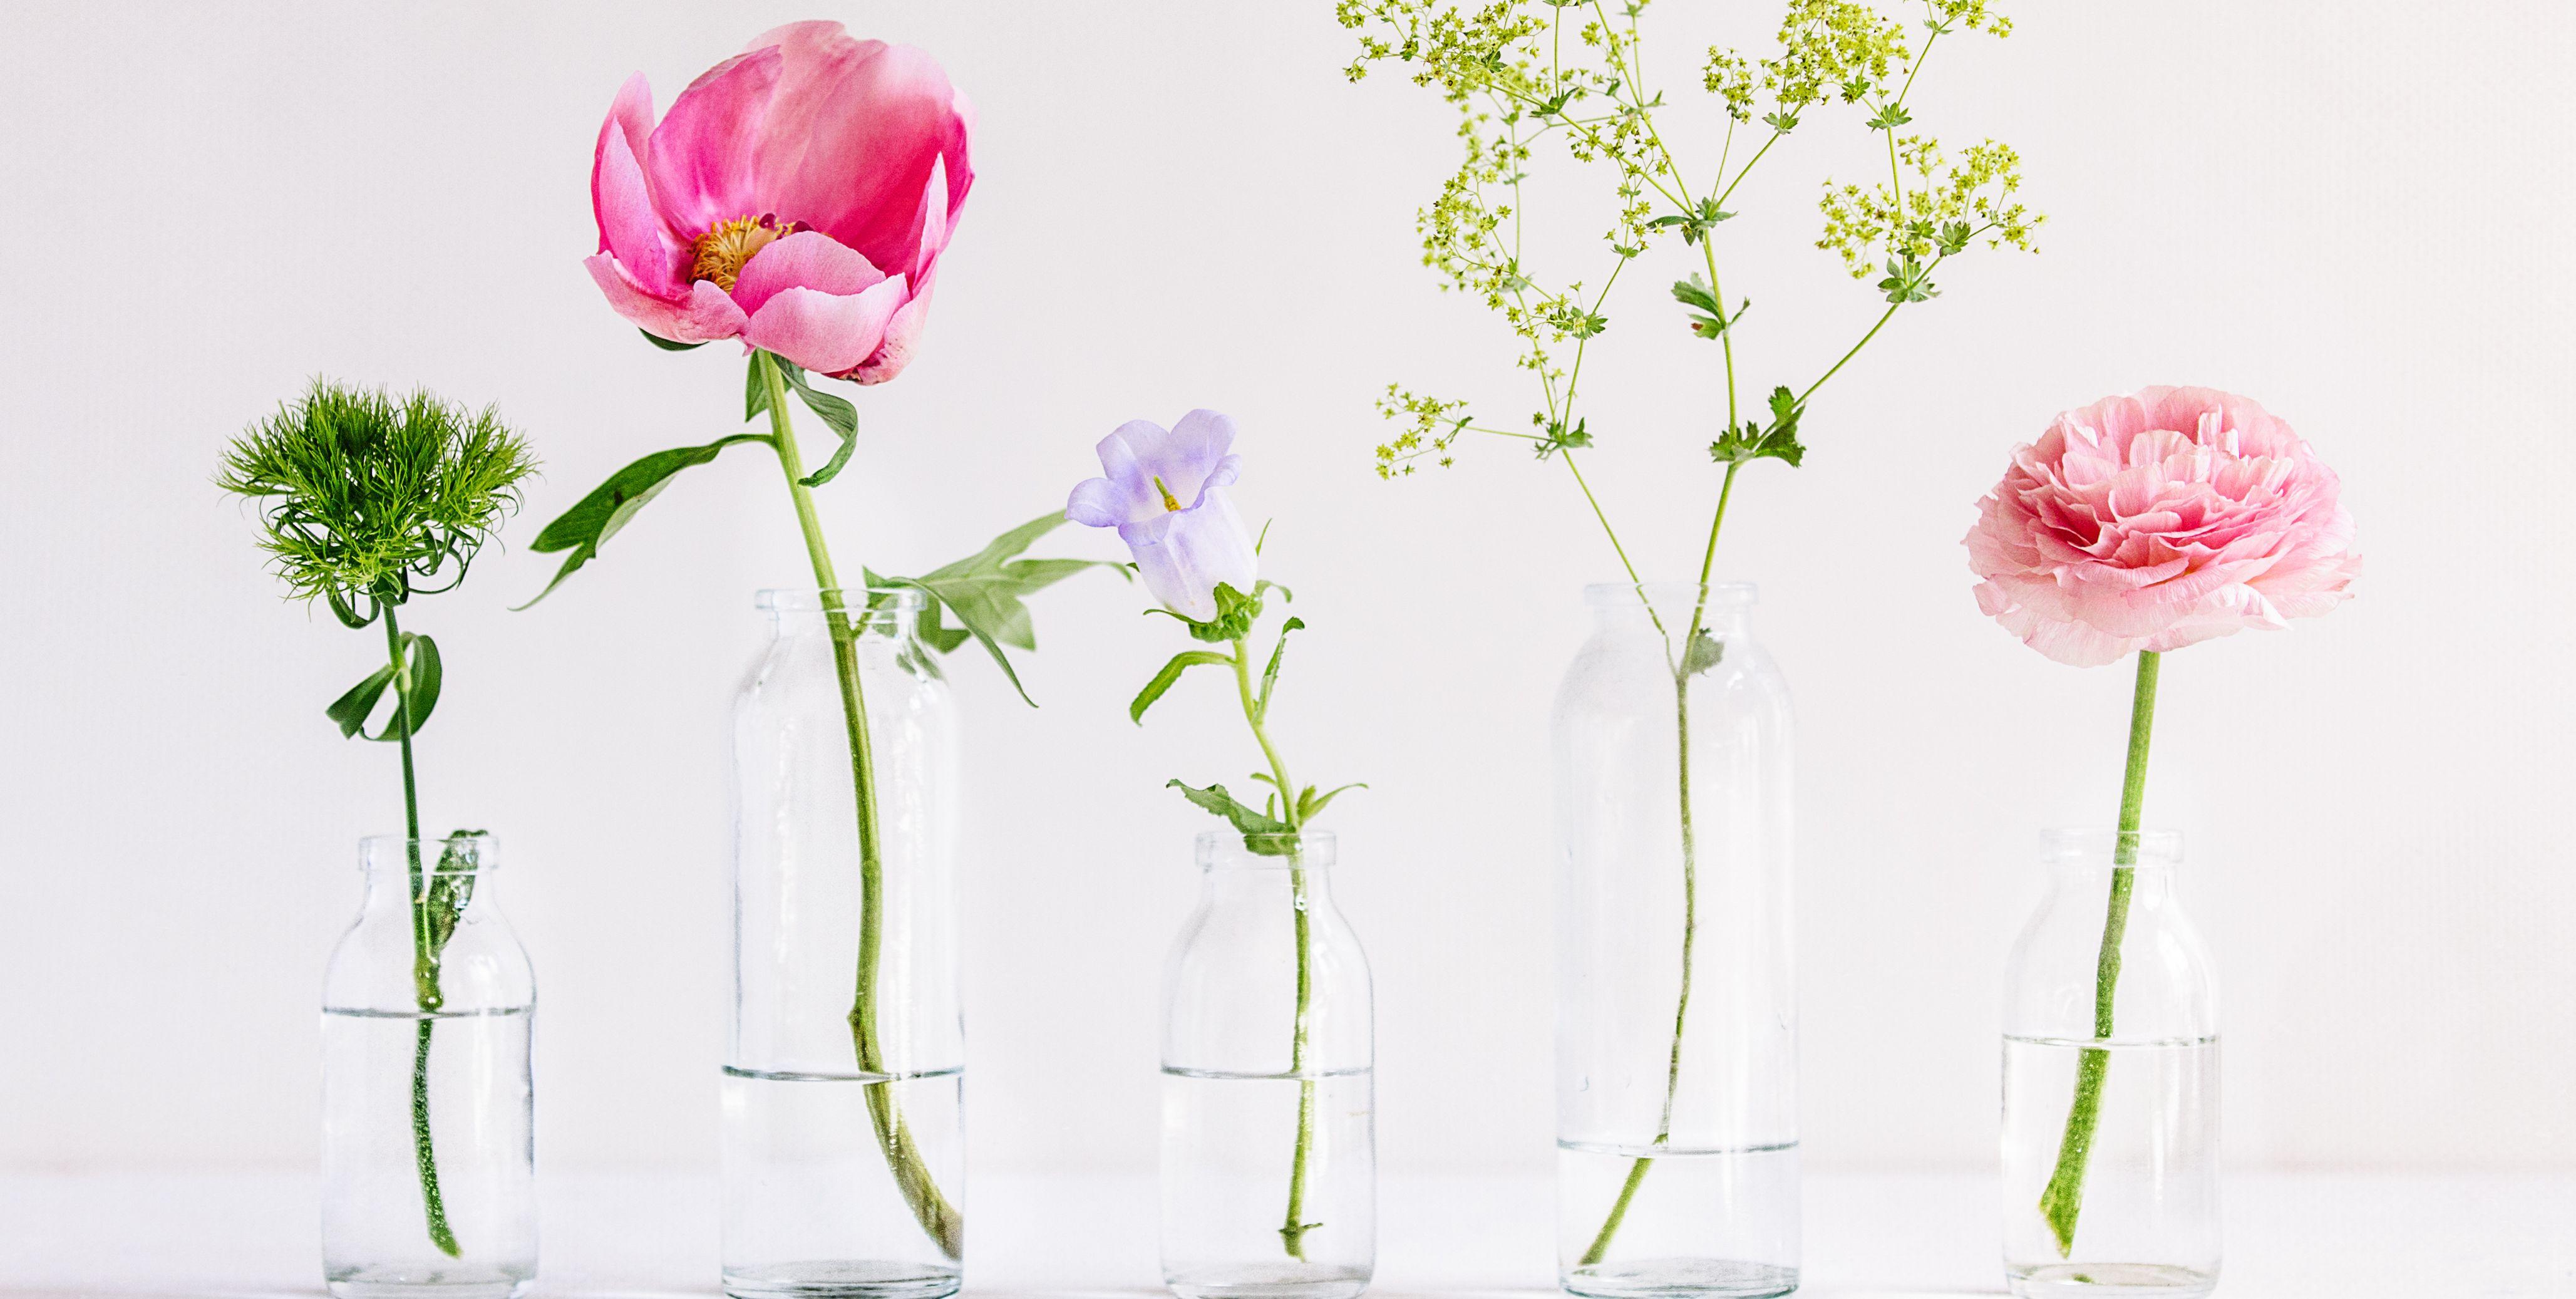 Spring flowers in glass vases